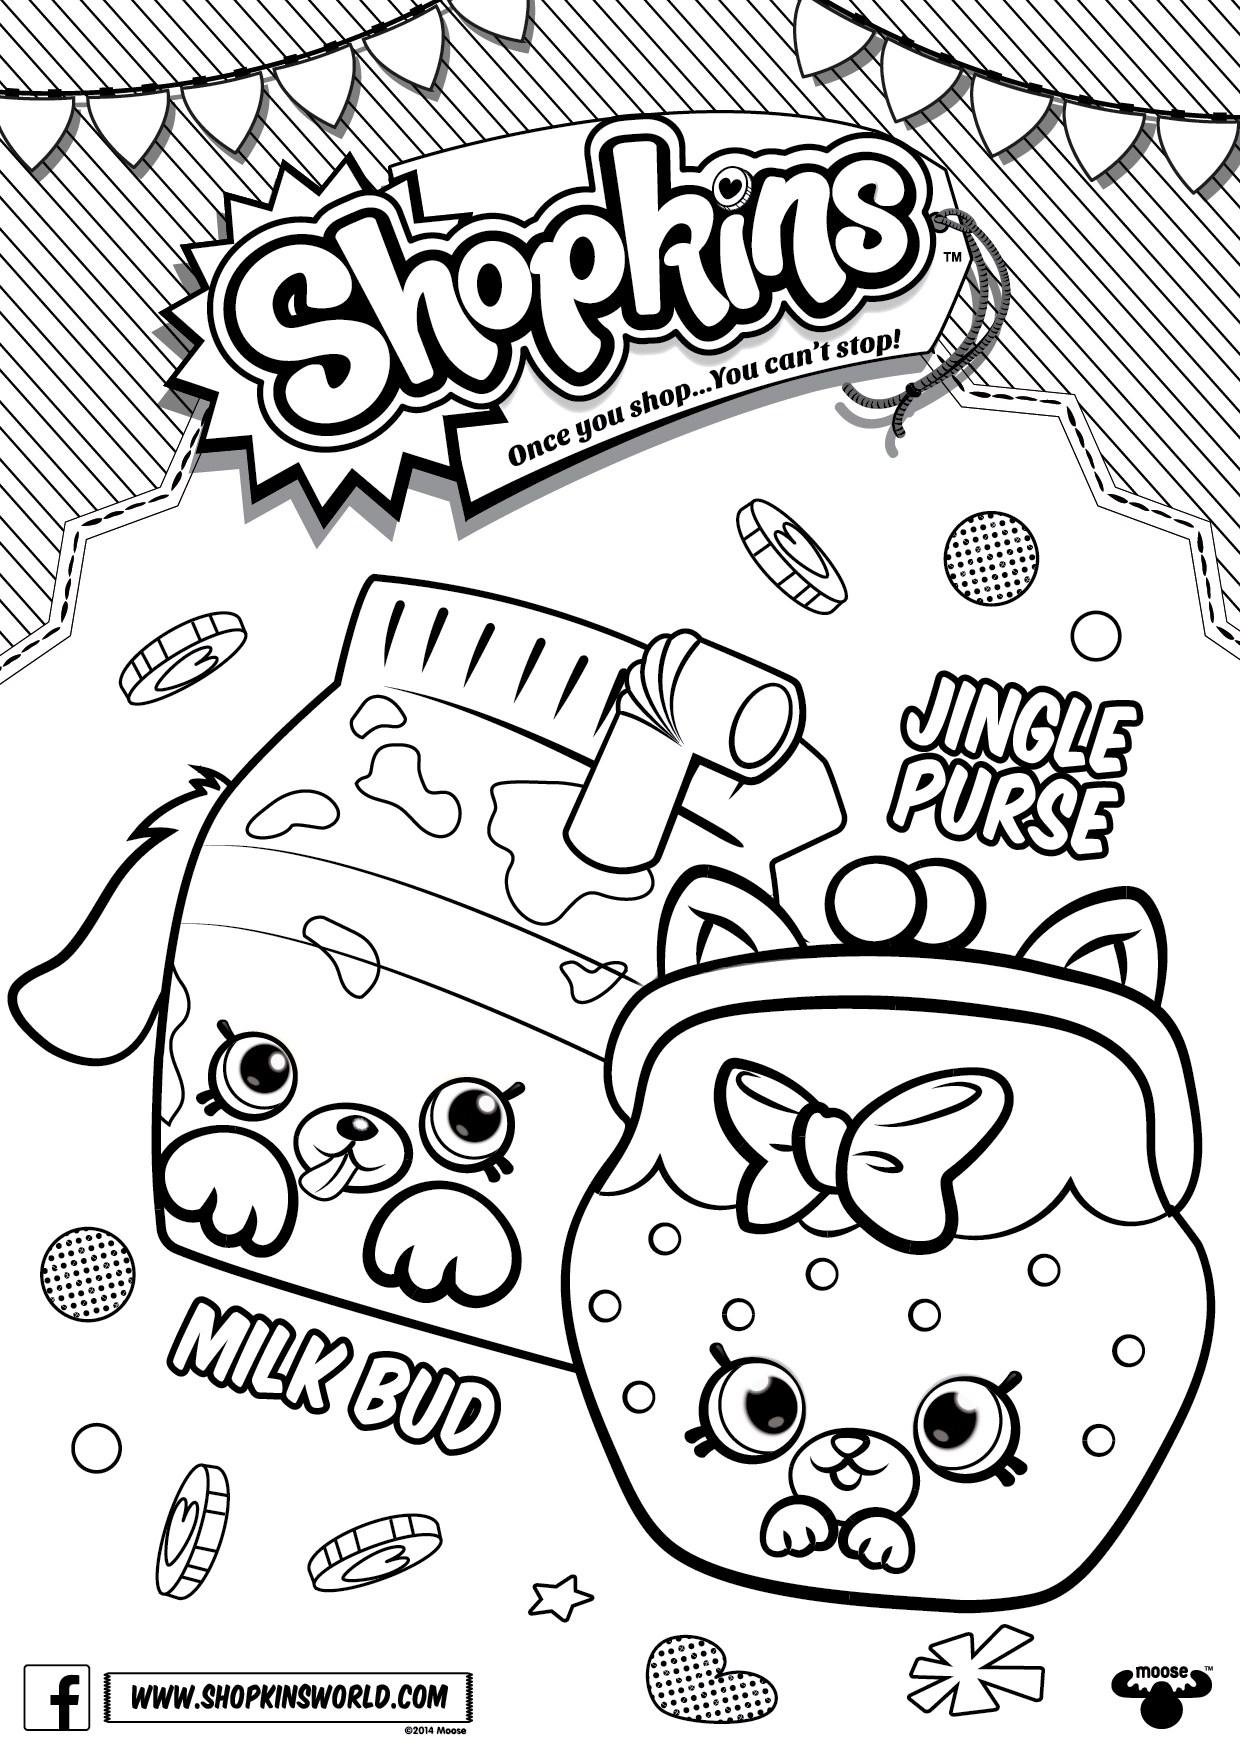 1240x1754 Shopkins Coloring Pages Season Petkins Jingle Purse Milk Bud